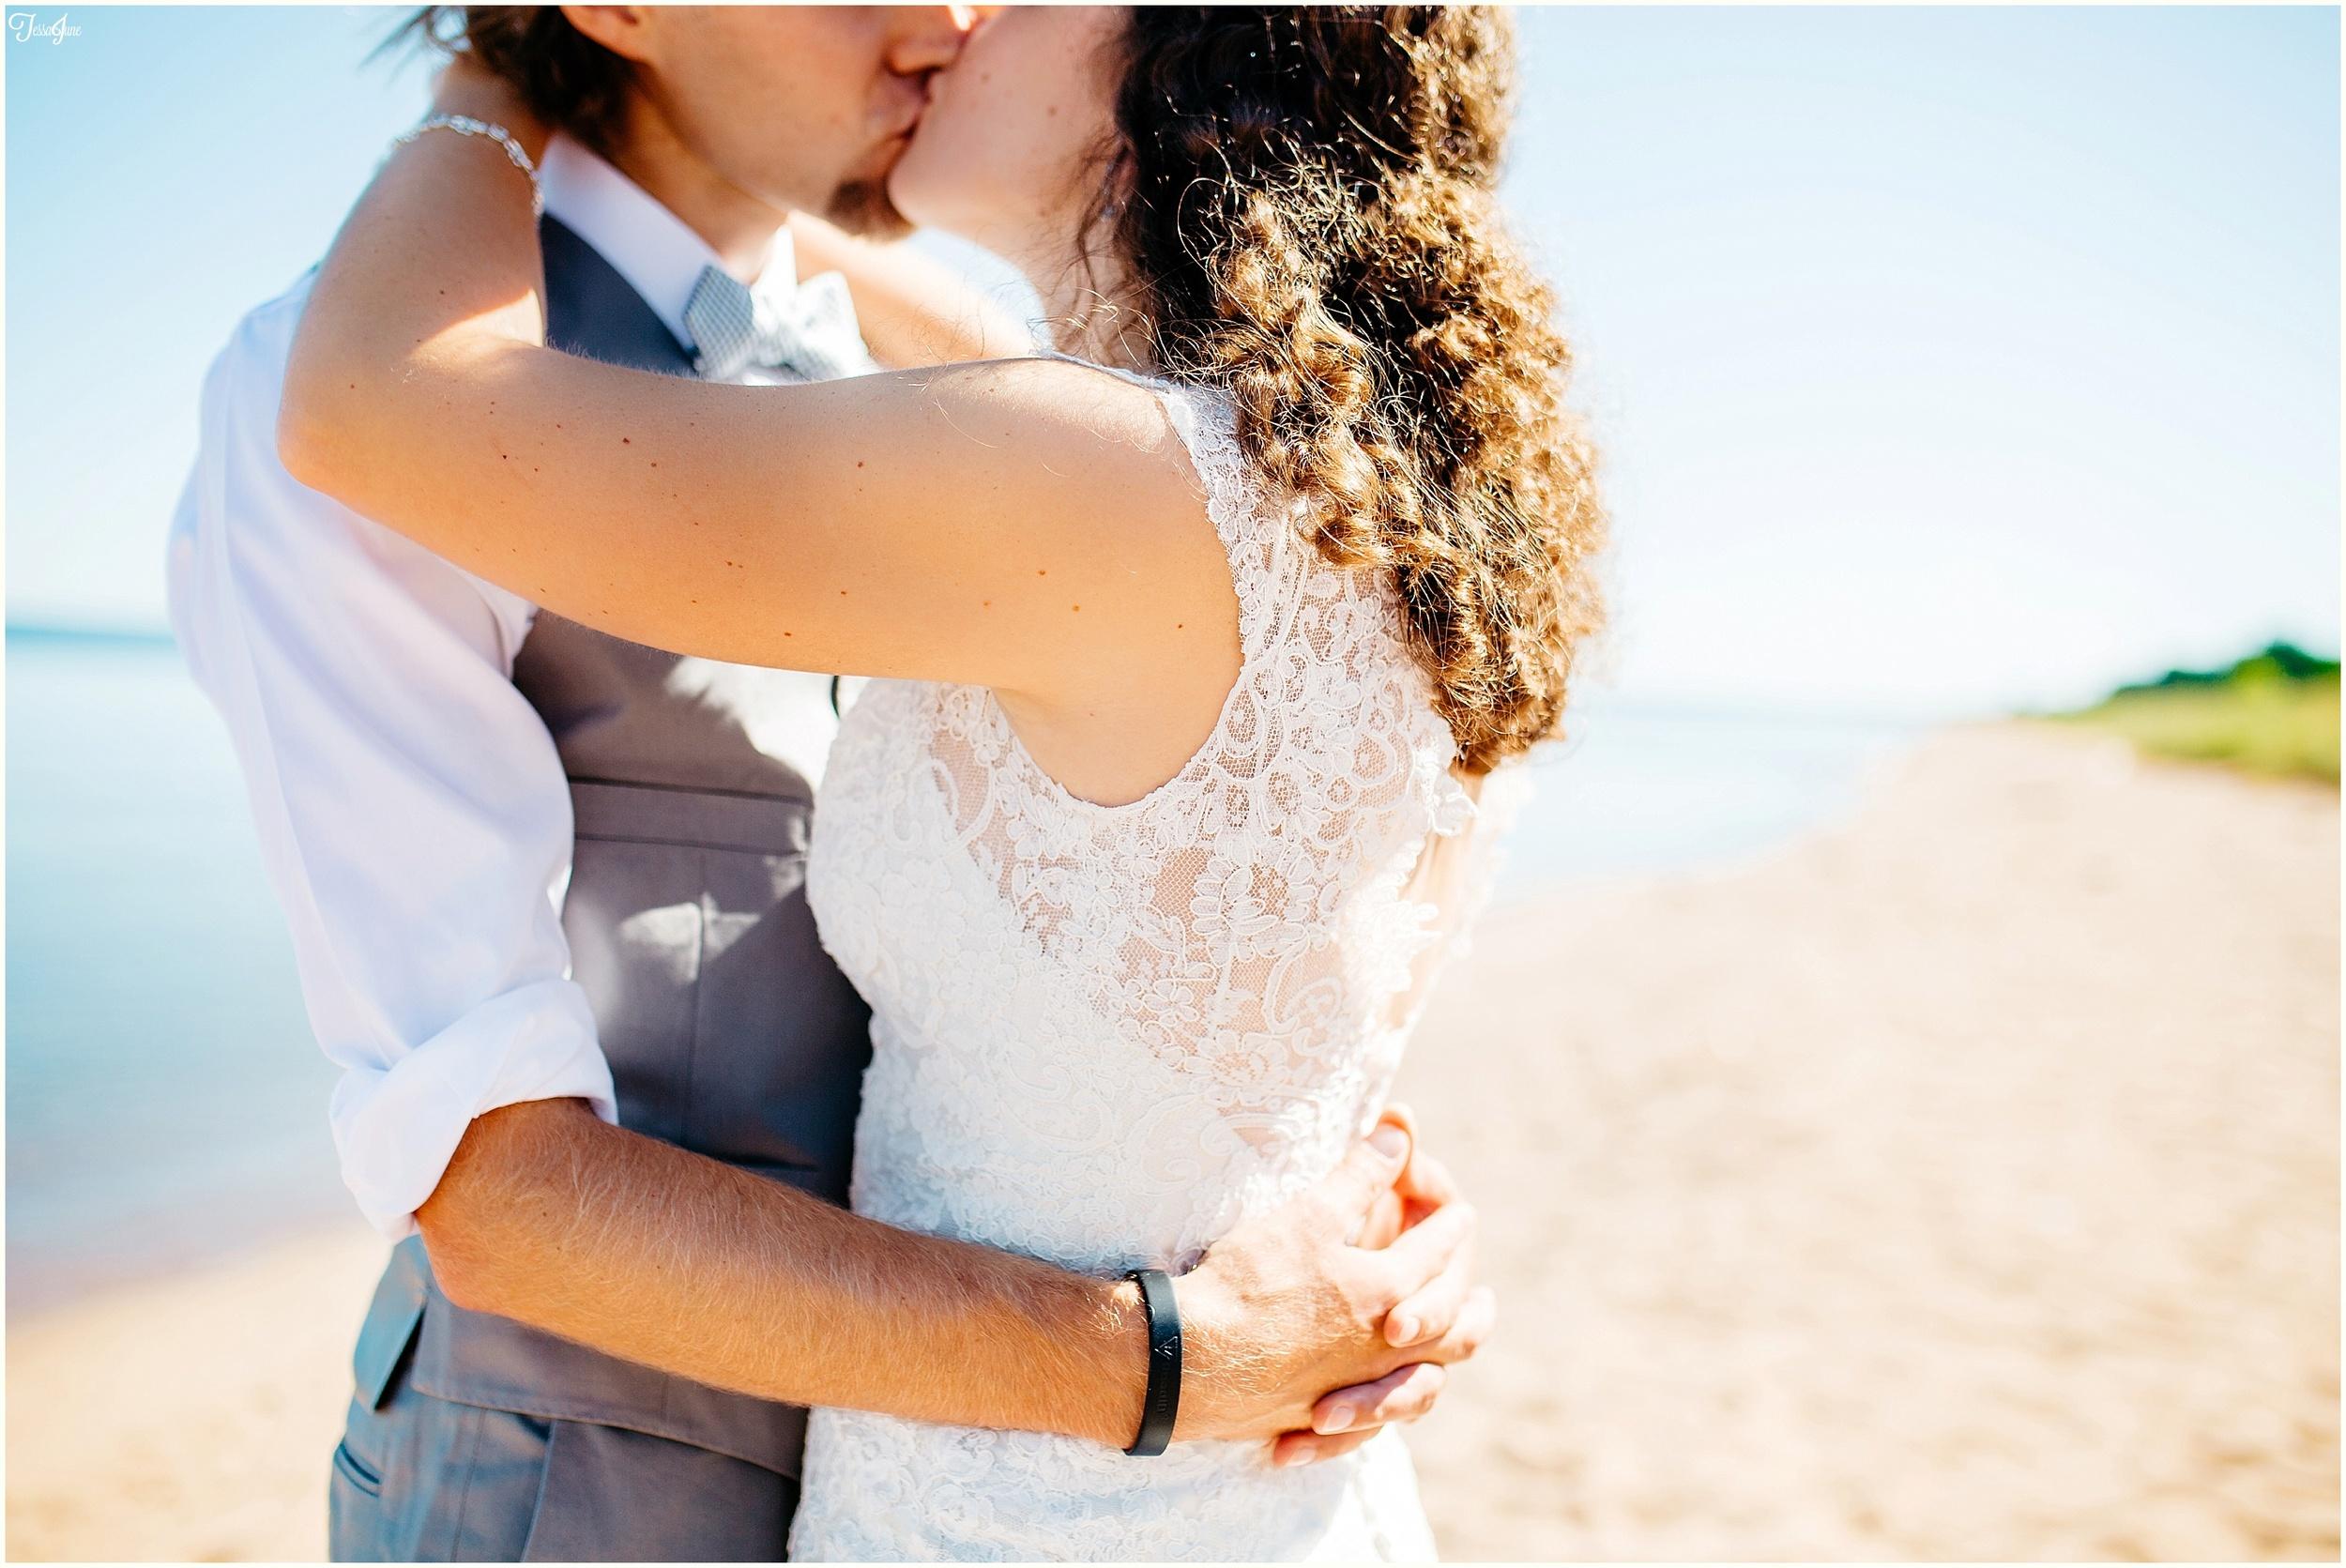 North-shore-beach-wedding-duluth-minnesota-st-cloud-photographer